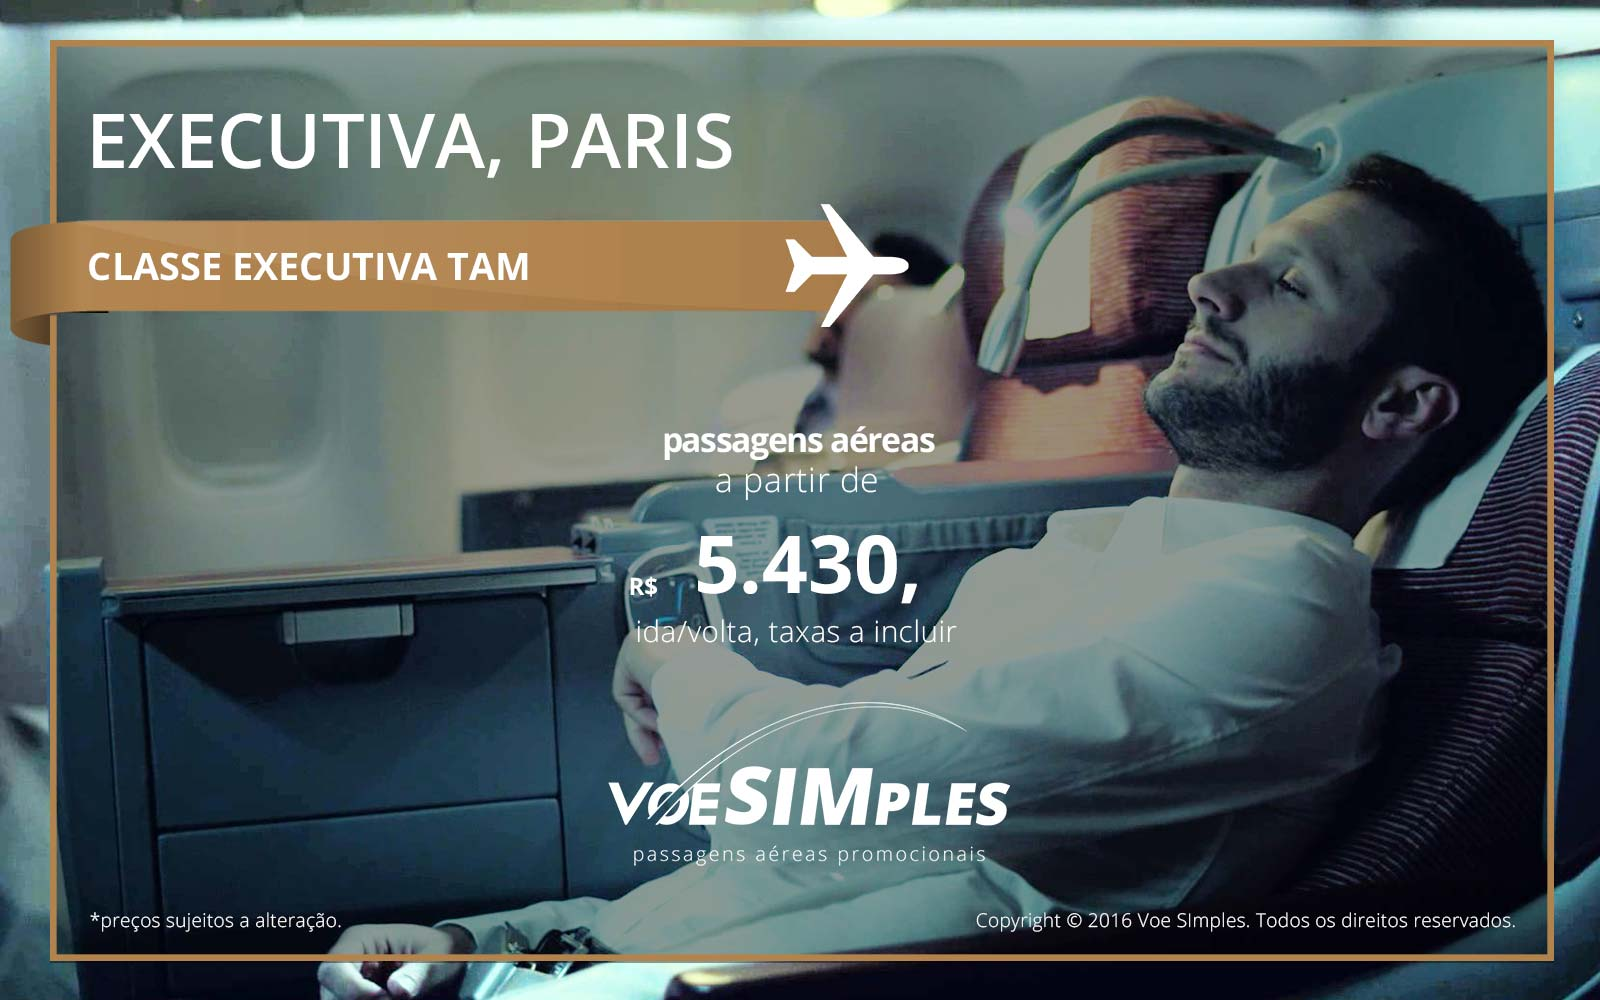 Passagem aérea Classe Executiva TAM para Paris